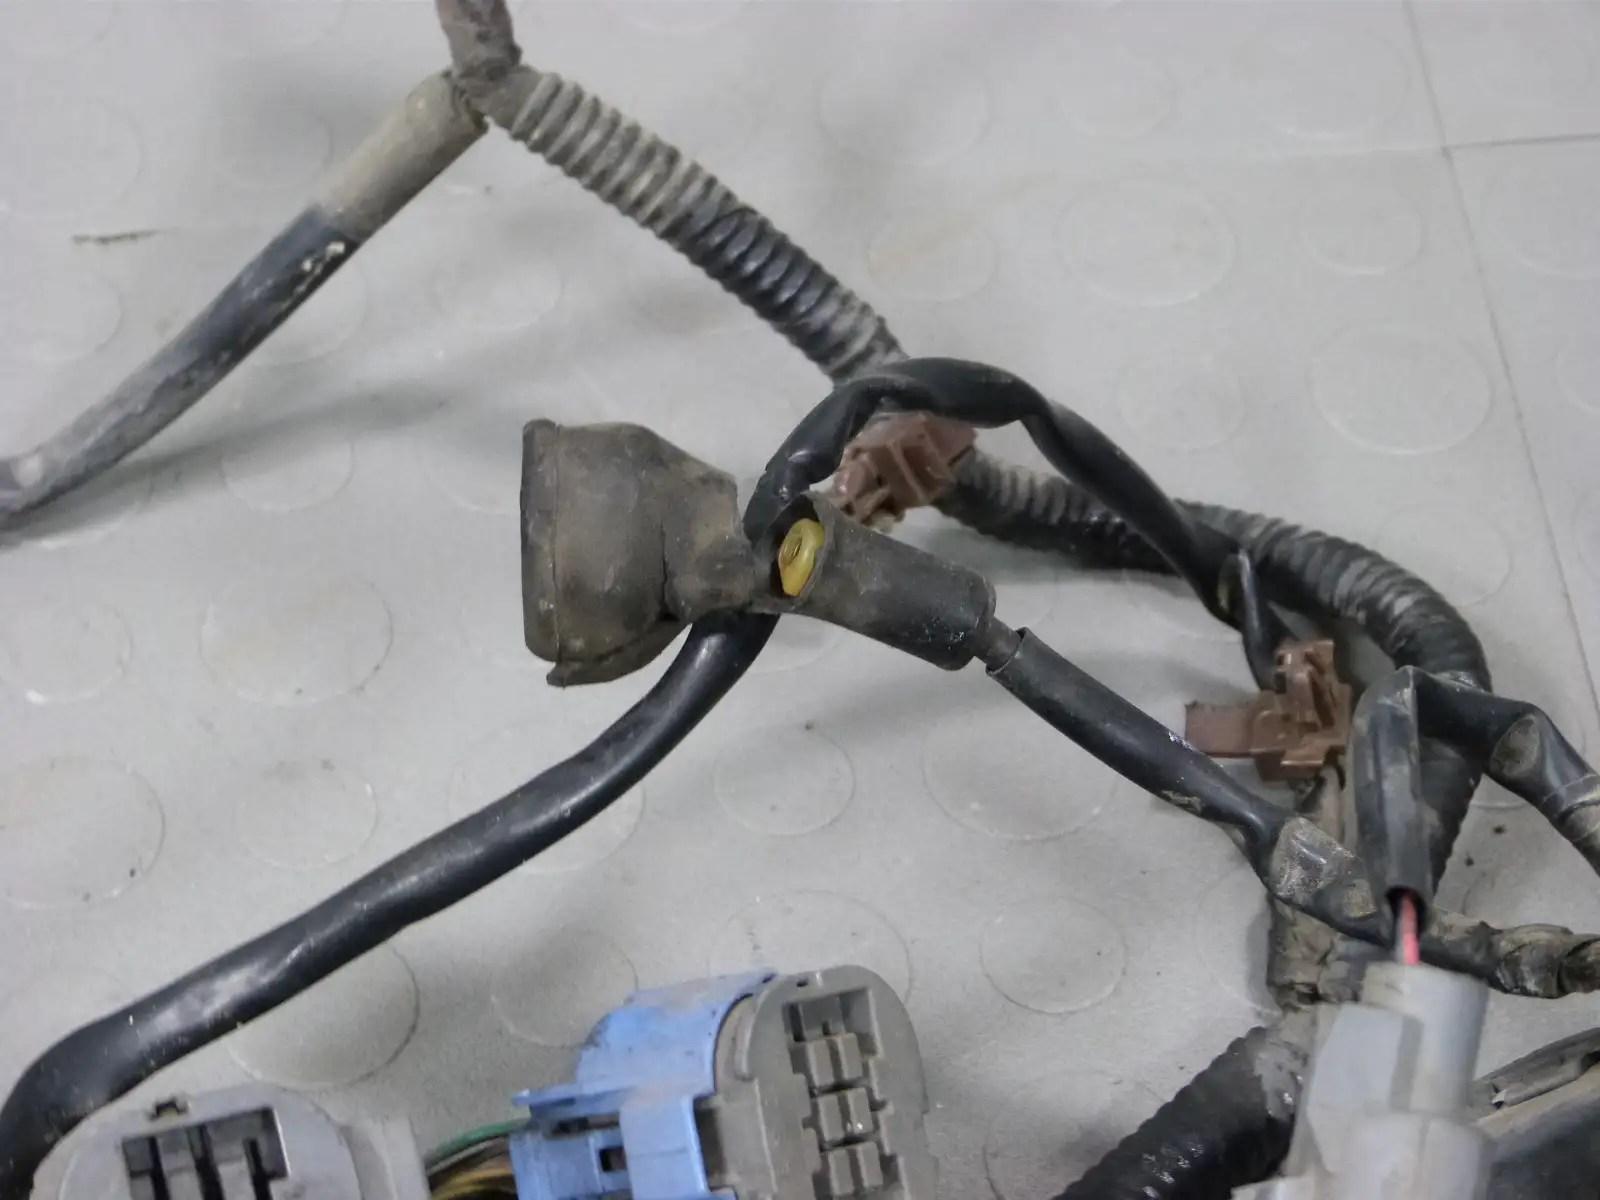 hight resolution of 96 97 98 honda civic ex obd2 sohc vtec d16y8 engine wire pcm wiring harness diagram